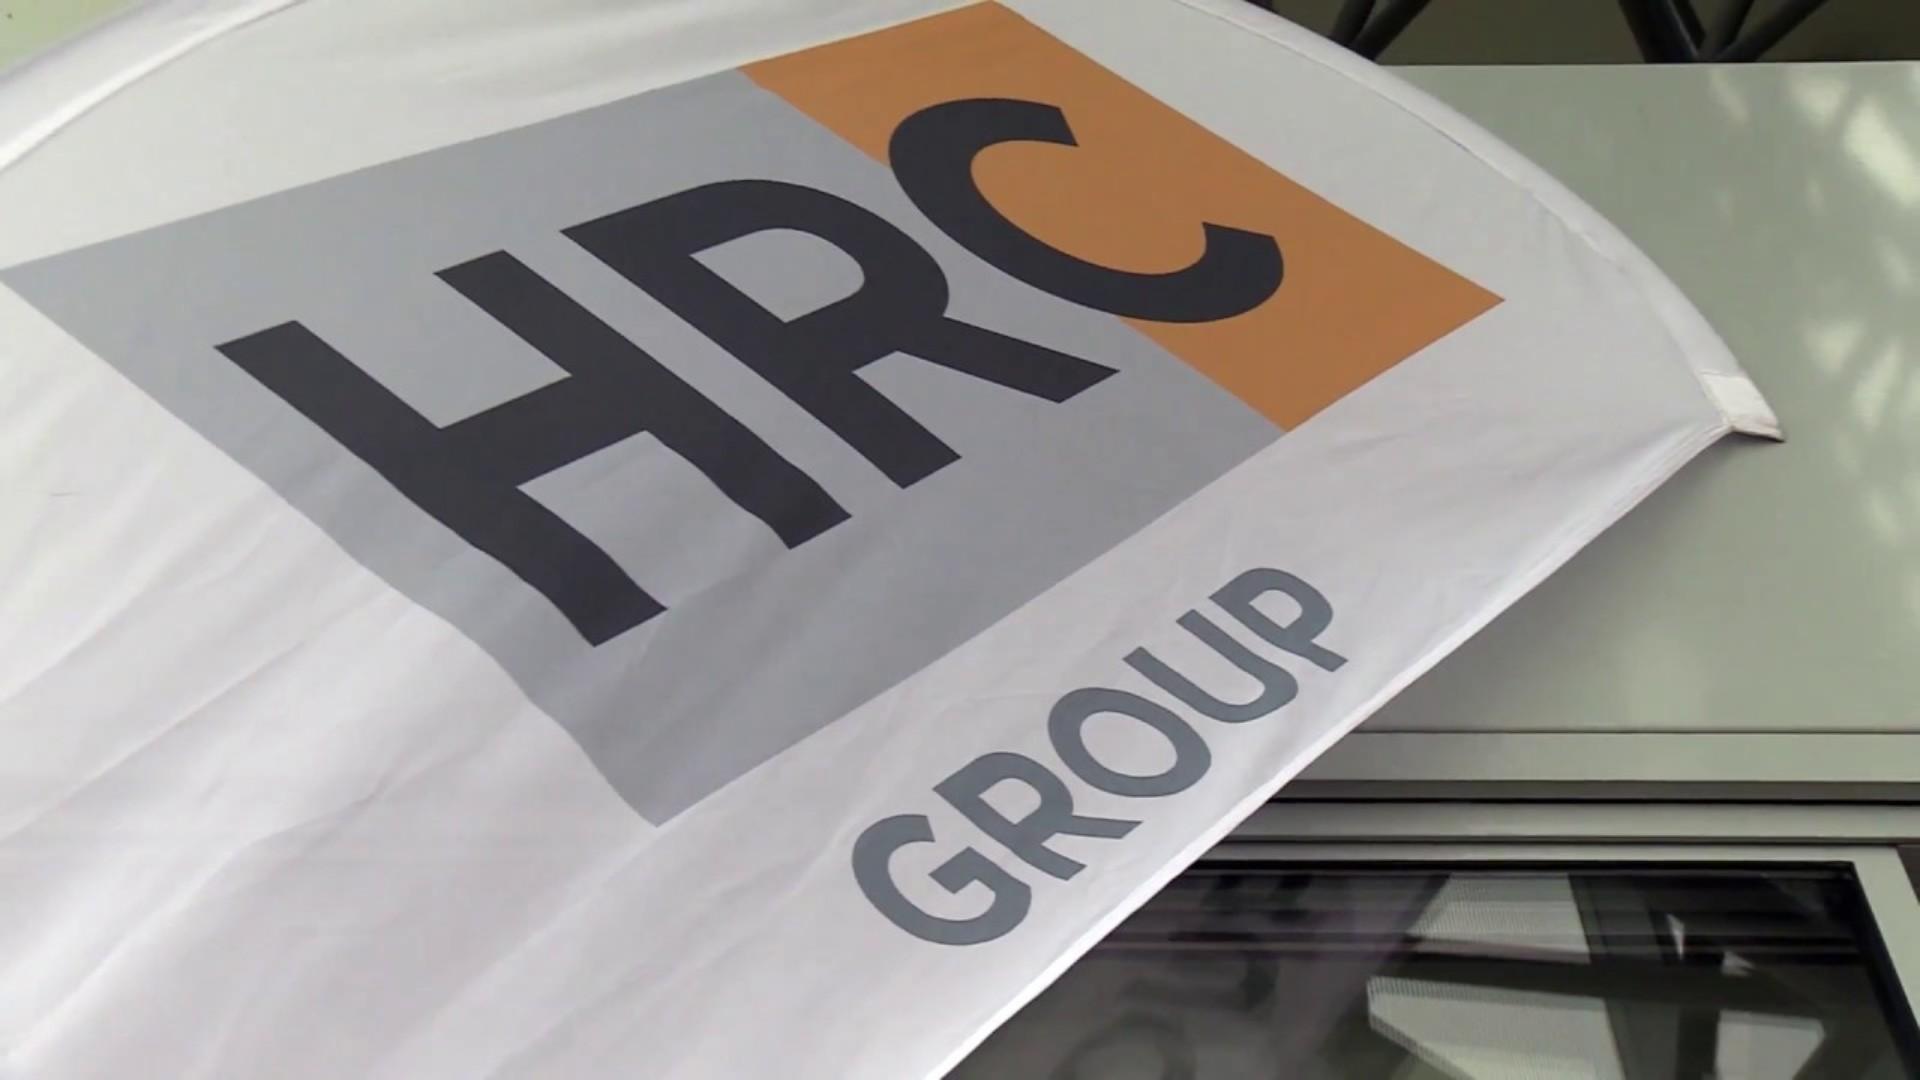 Hrc-group_1920x1080.jpg